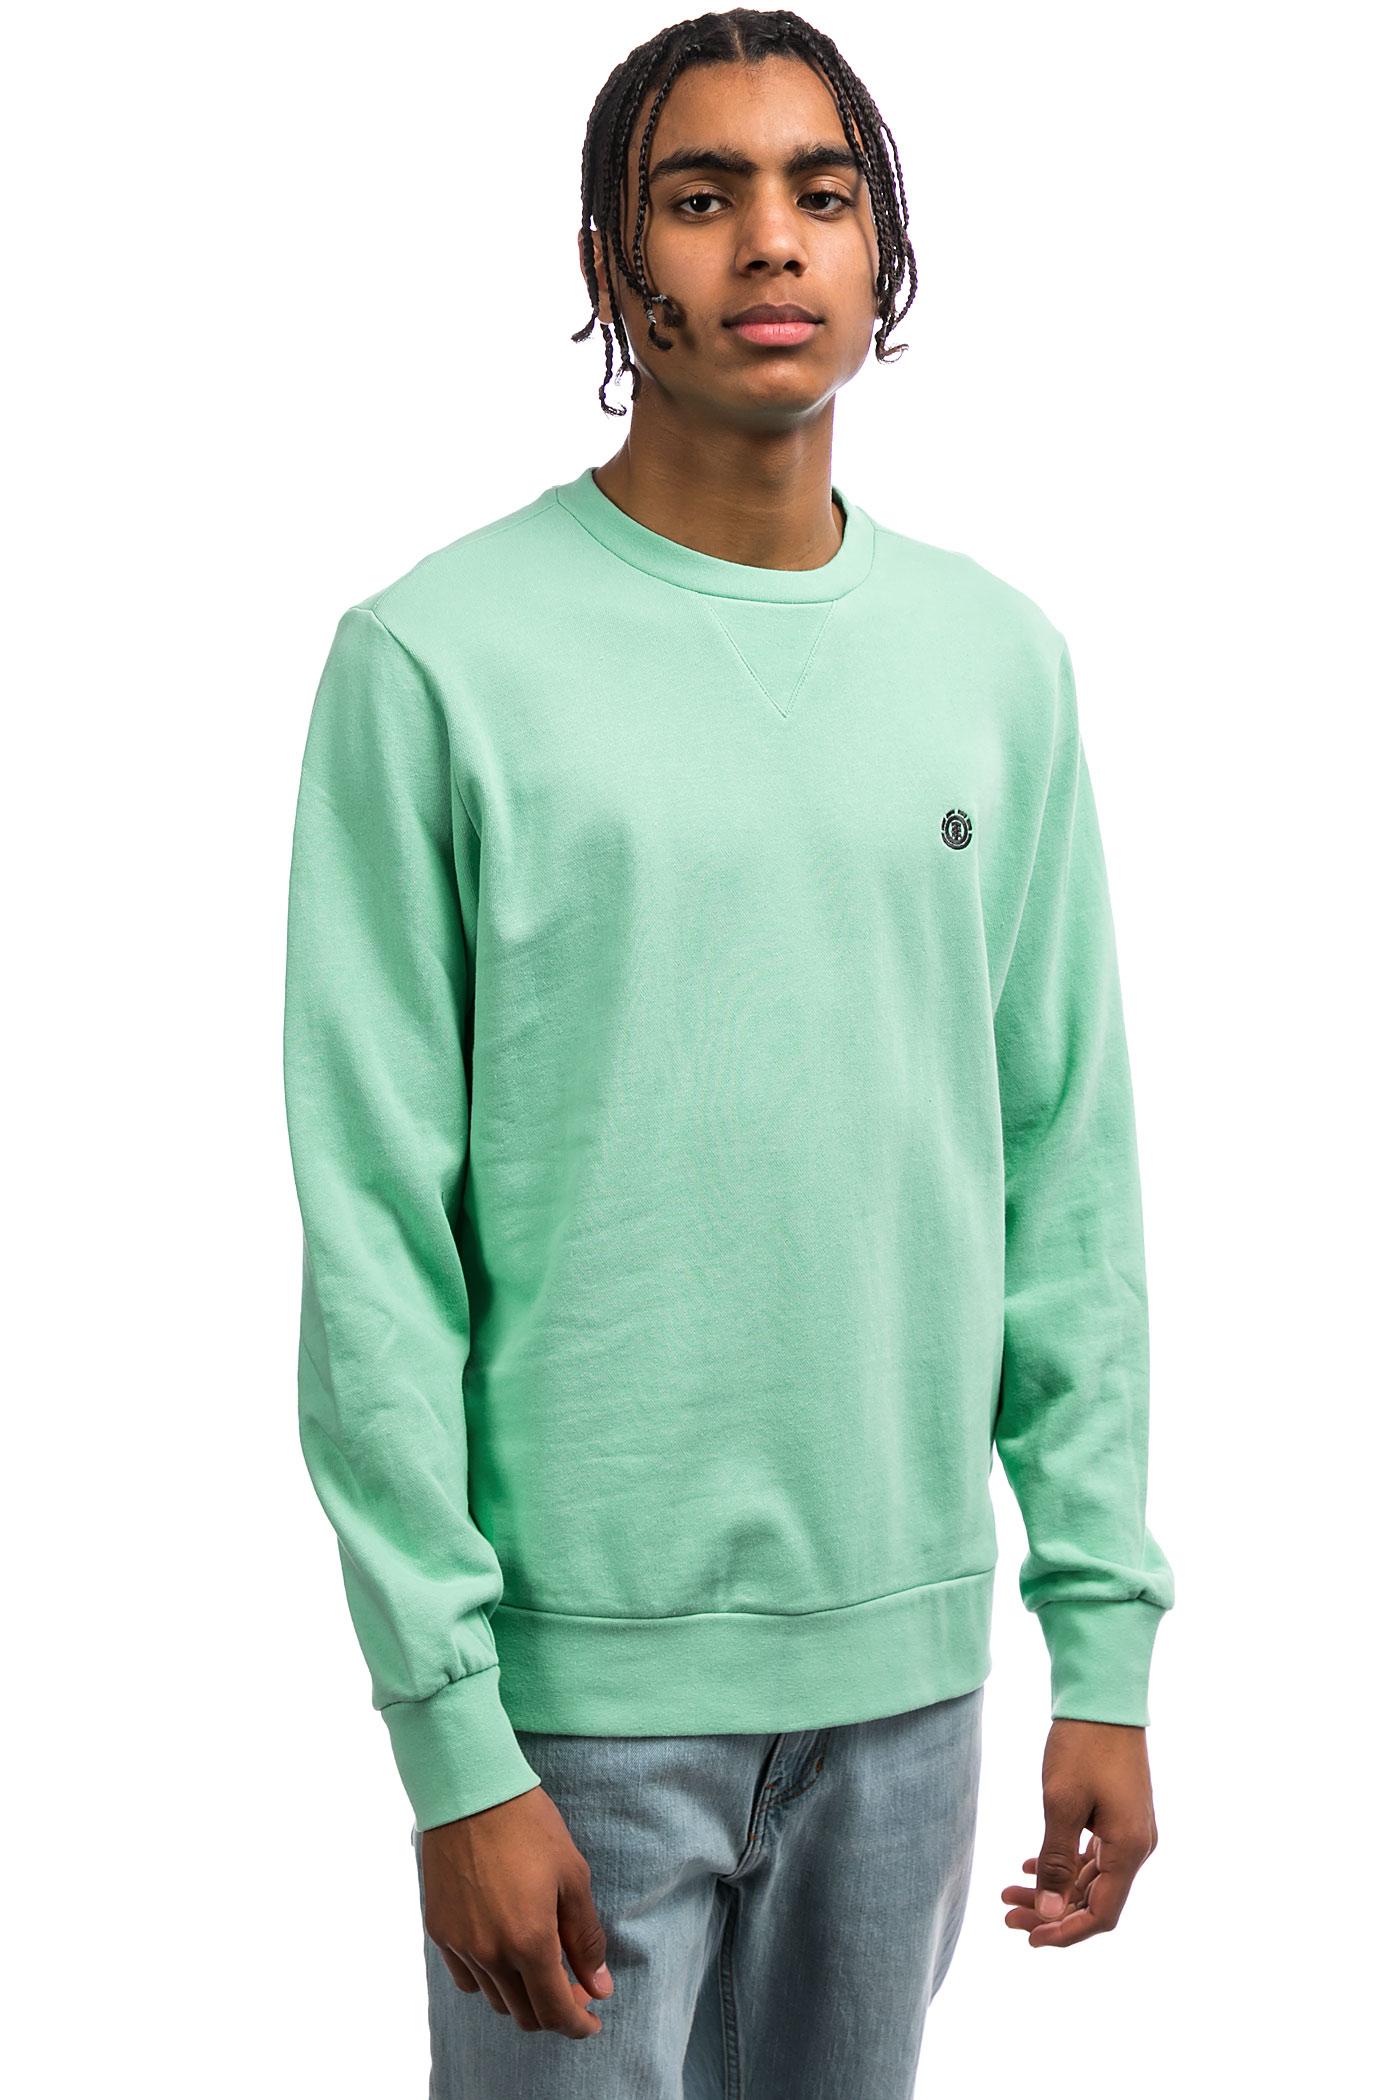 element cornell pastel sweatshirt mint kaufen bei skatedeluxe. Black Bedroom Furniture Sets. Home Design Ideas